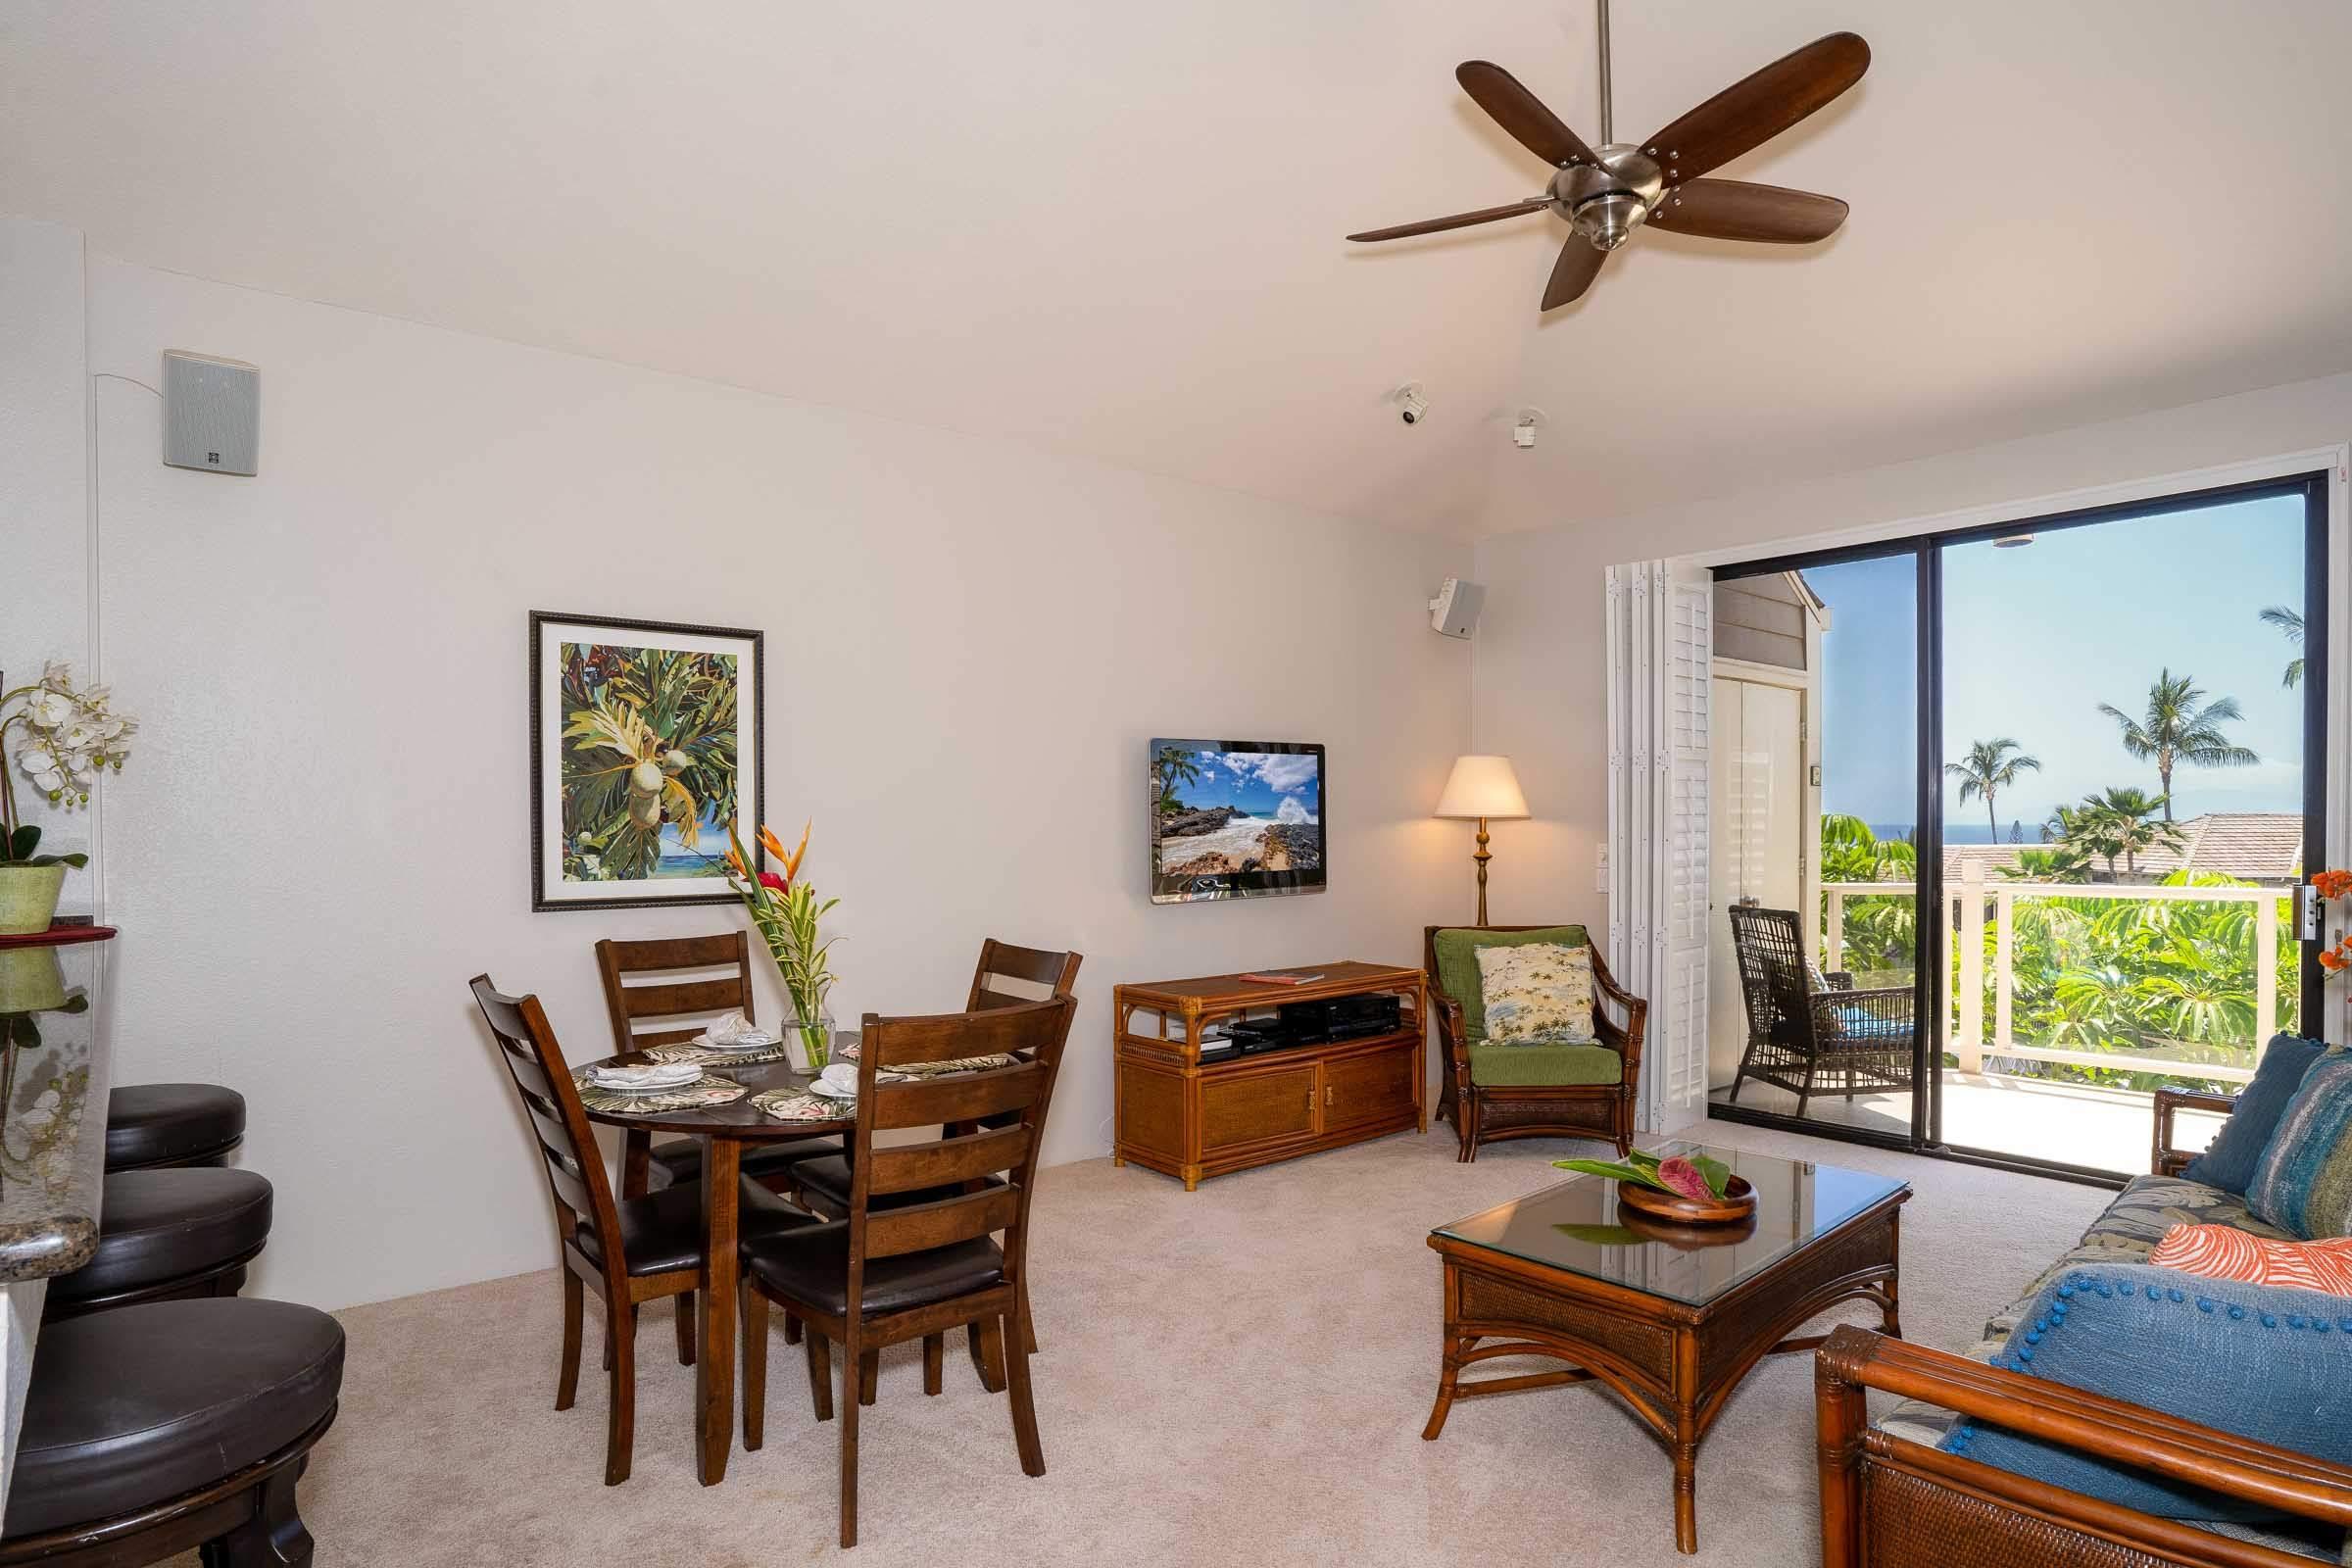 Hawaii Life Real Estate Brokers – Wailea, Maui